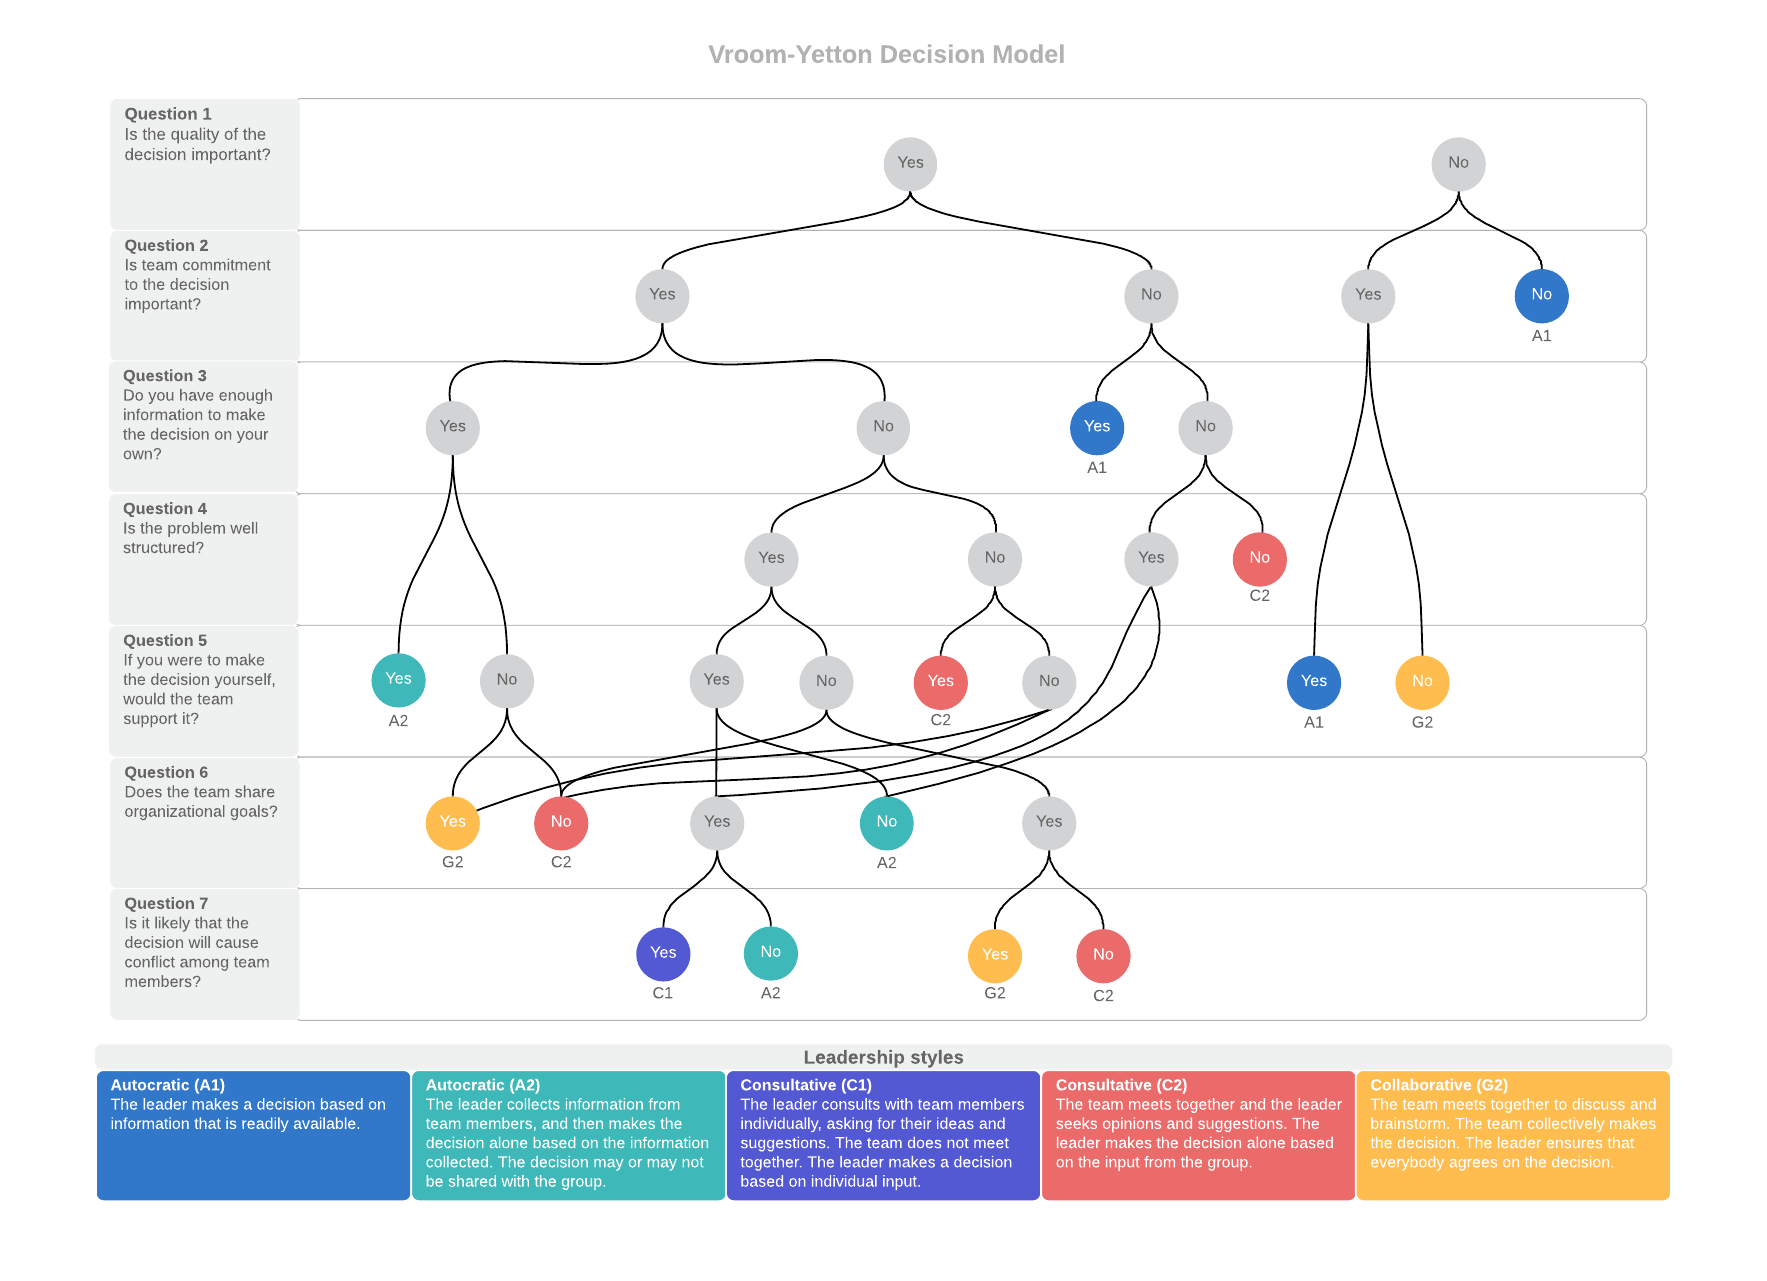 Vroom-Yetton Decision Model